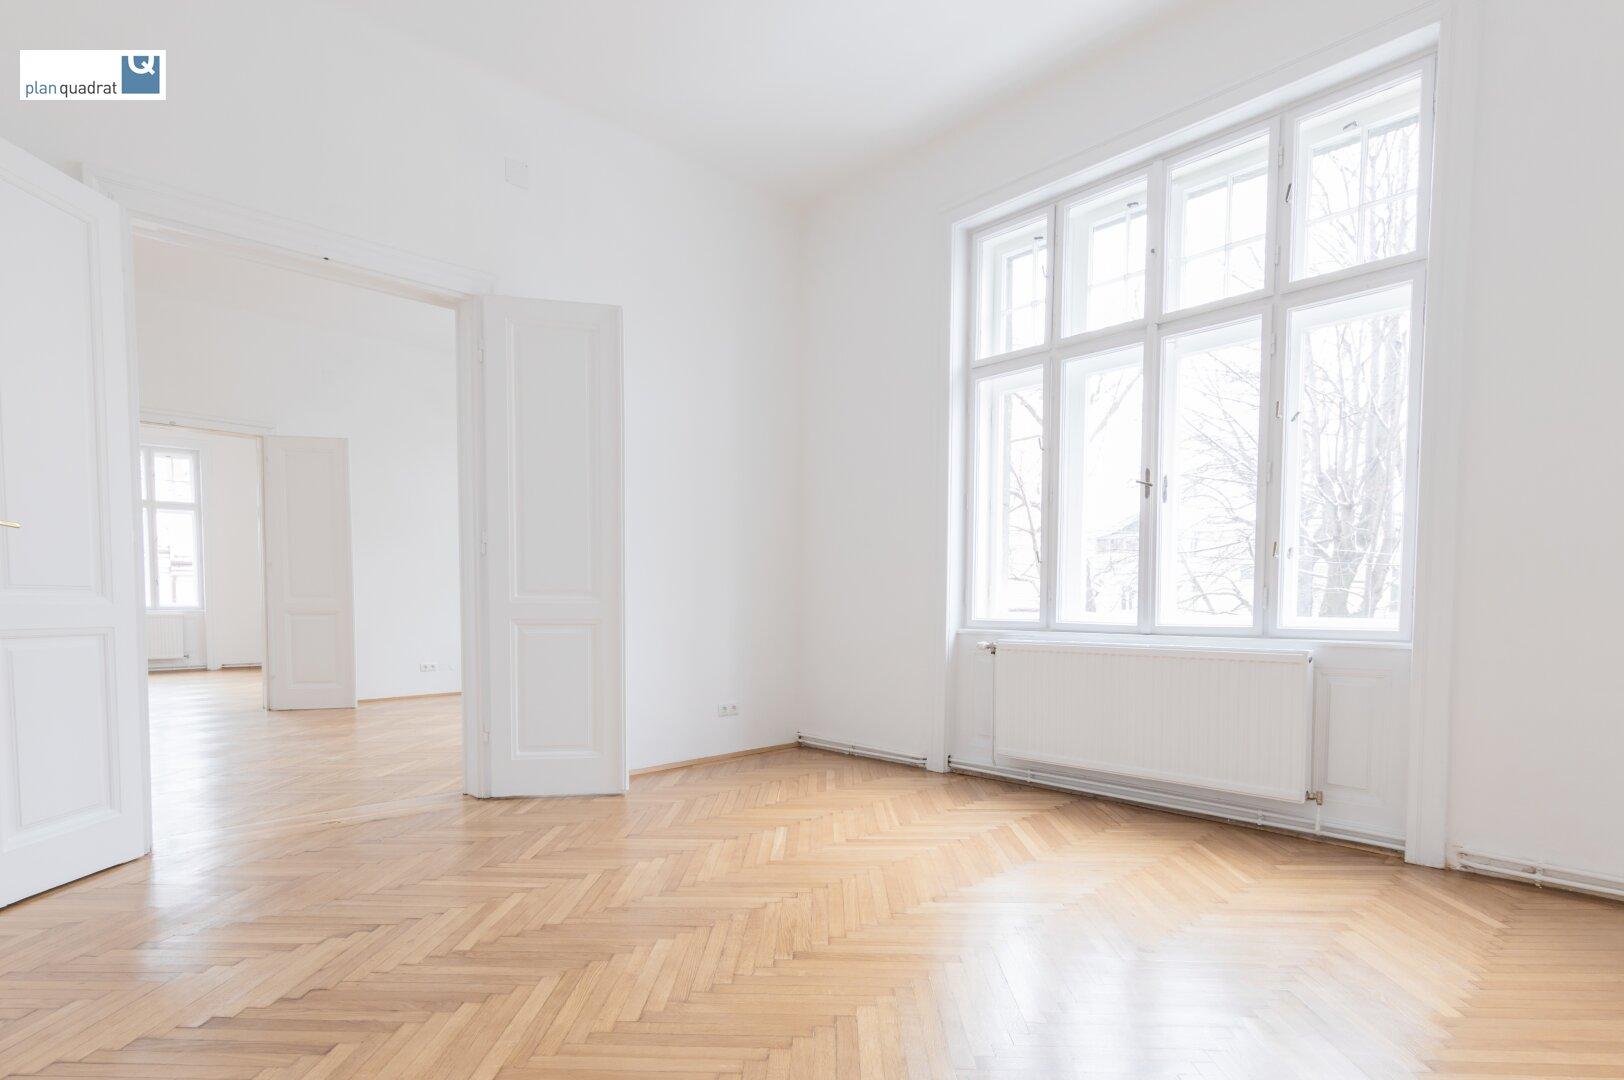 Zimmer 3 (gem. Plan; ca. 18,70 qm)